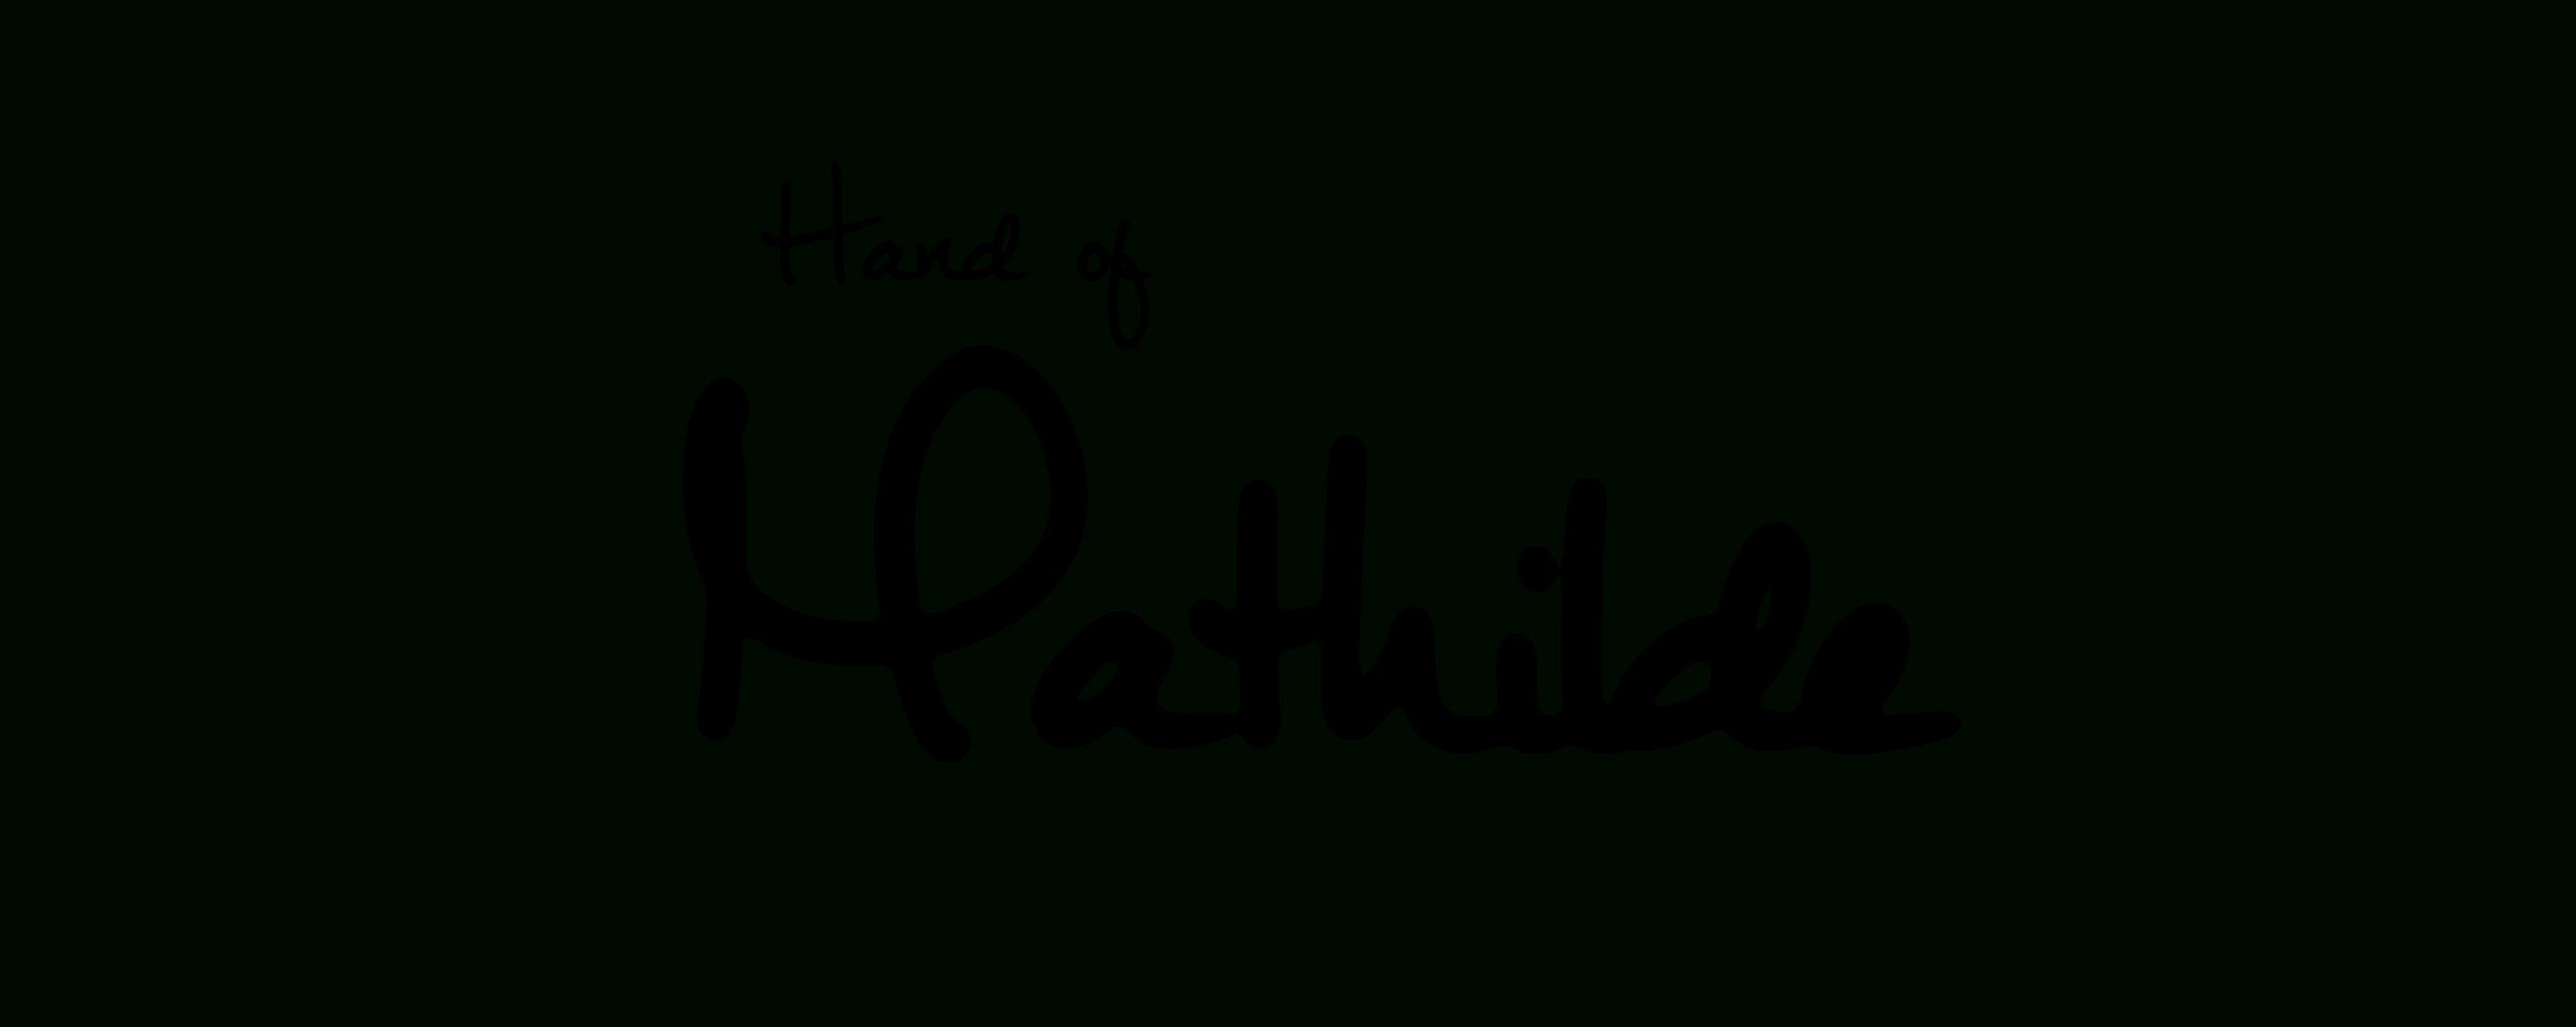 9 Cursive Handwriting Font Free Download Images - Free